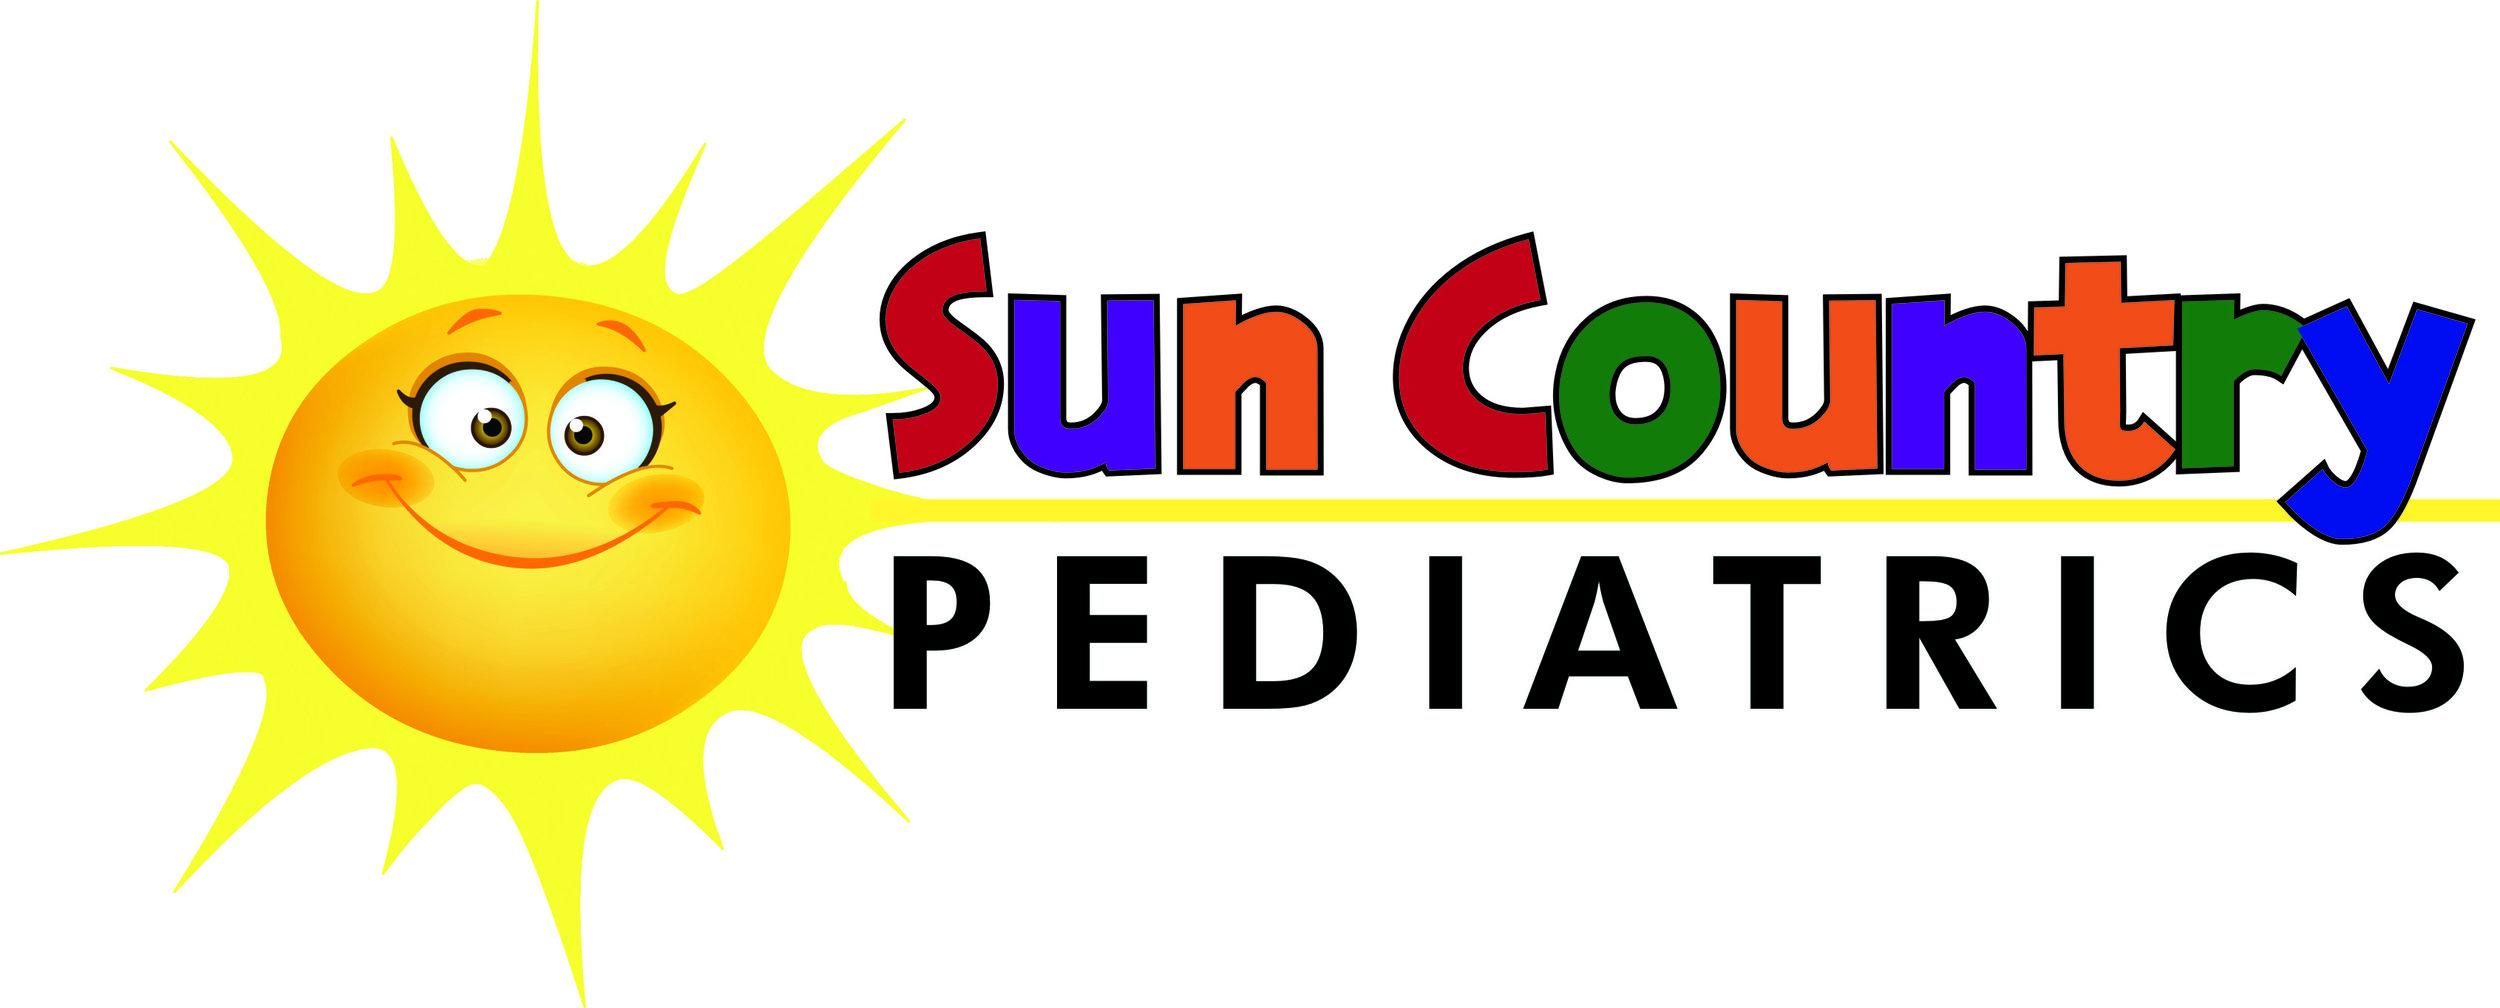 Sun Country Pediatrics